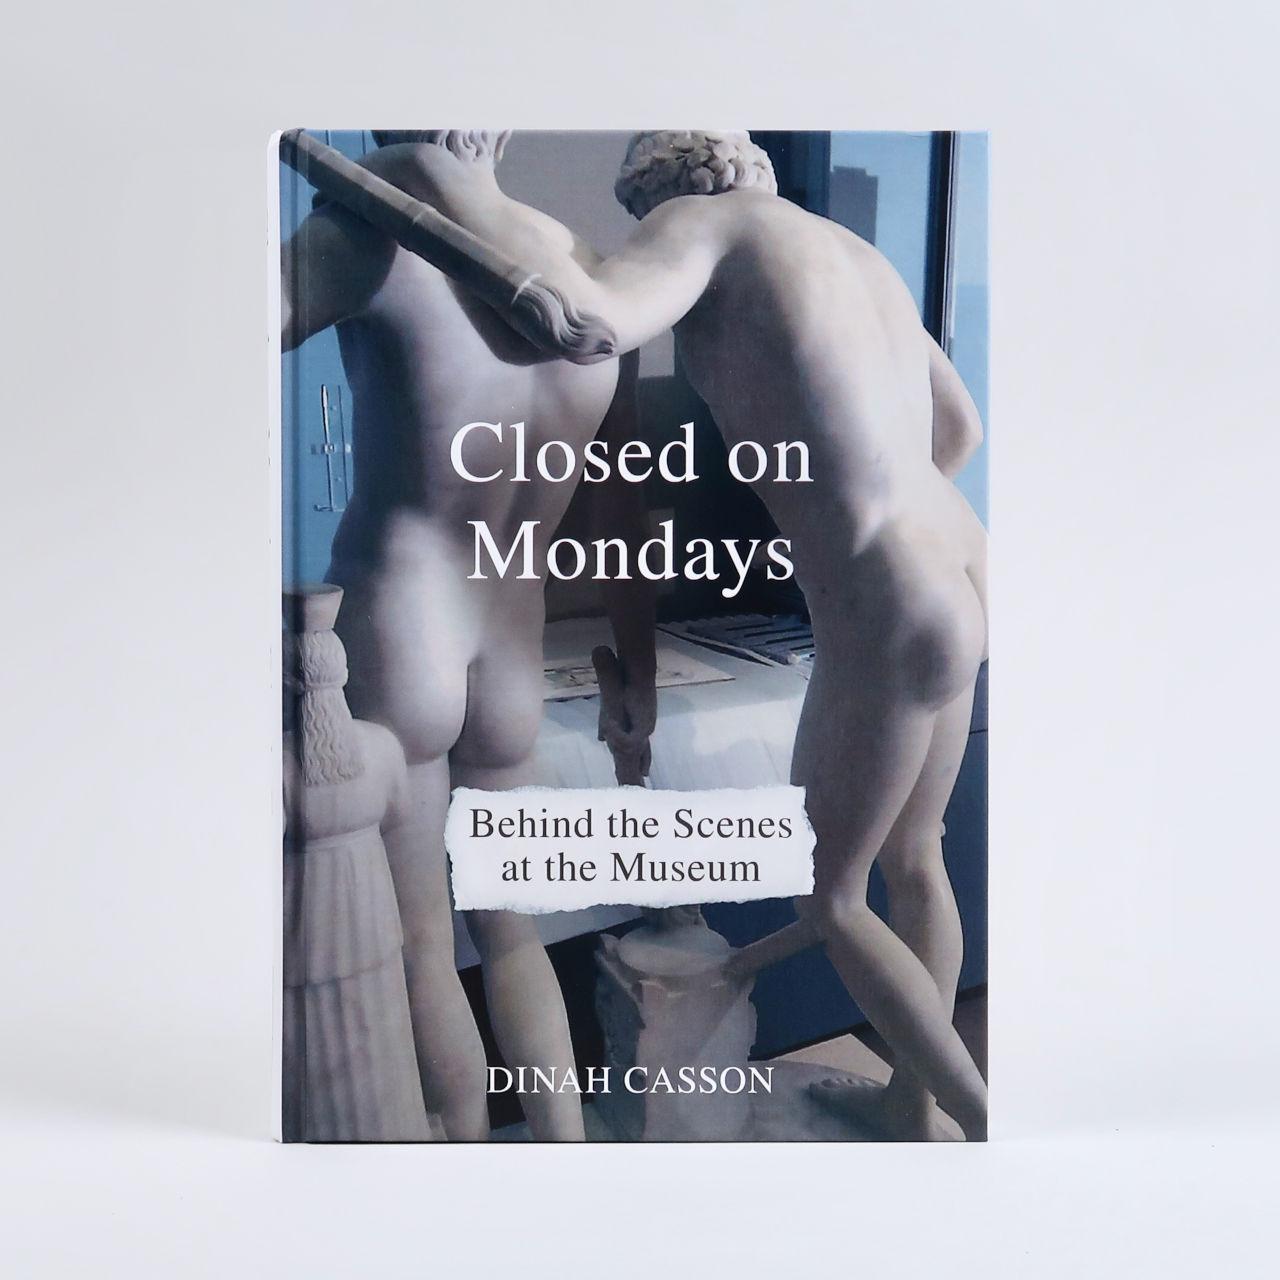 Closed on Mondays - Dinah Casson